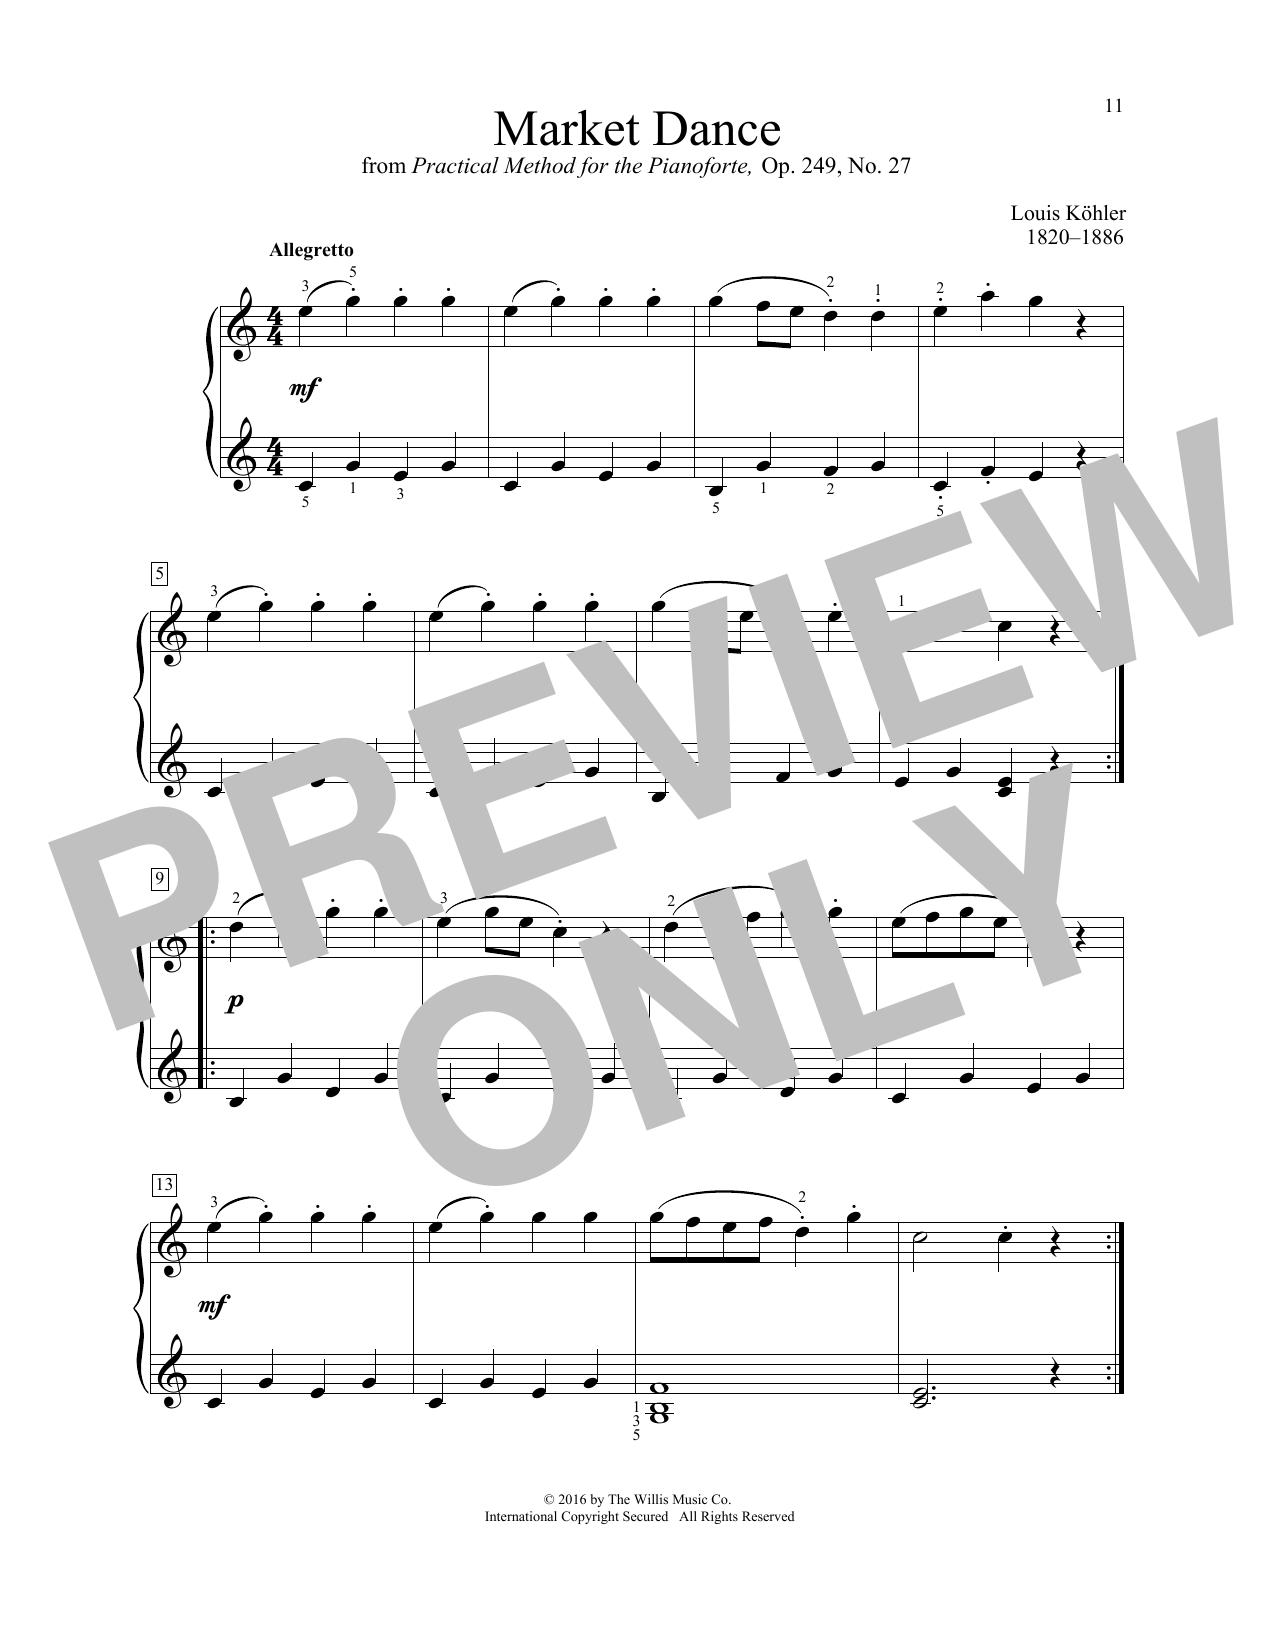 Louis Kohler Market Dance sheet music notes and chords. Download Printable PDF.